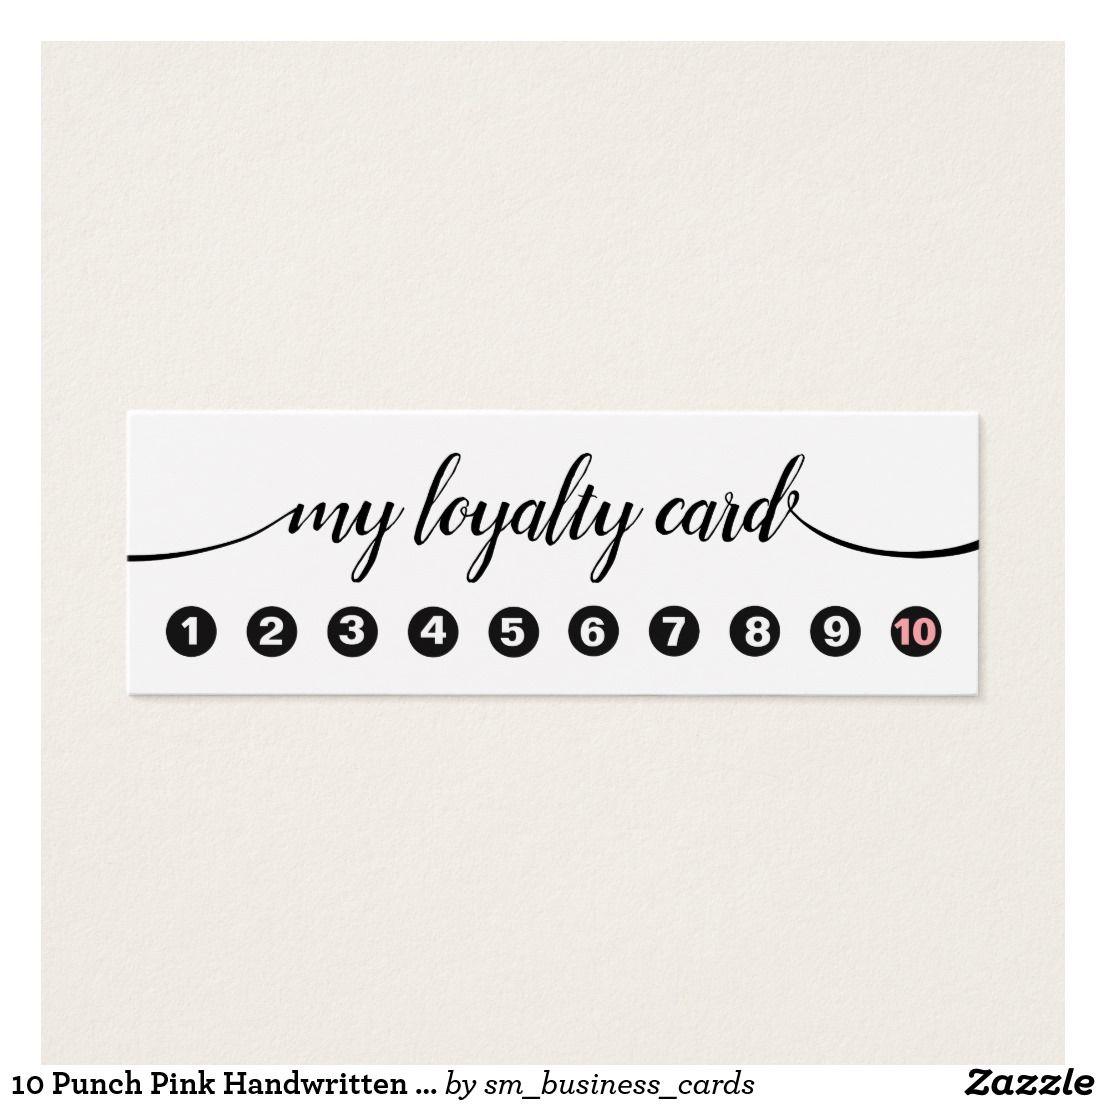 10 punch handwritten calligraphy loyalty